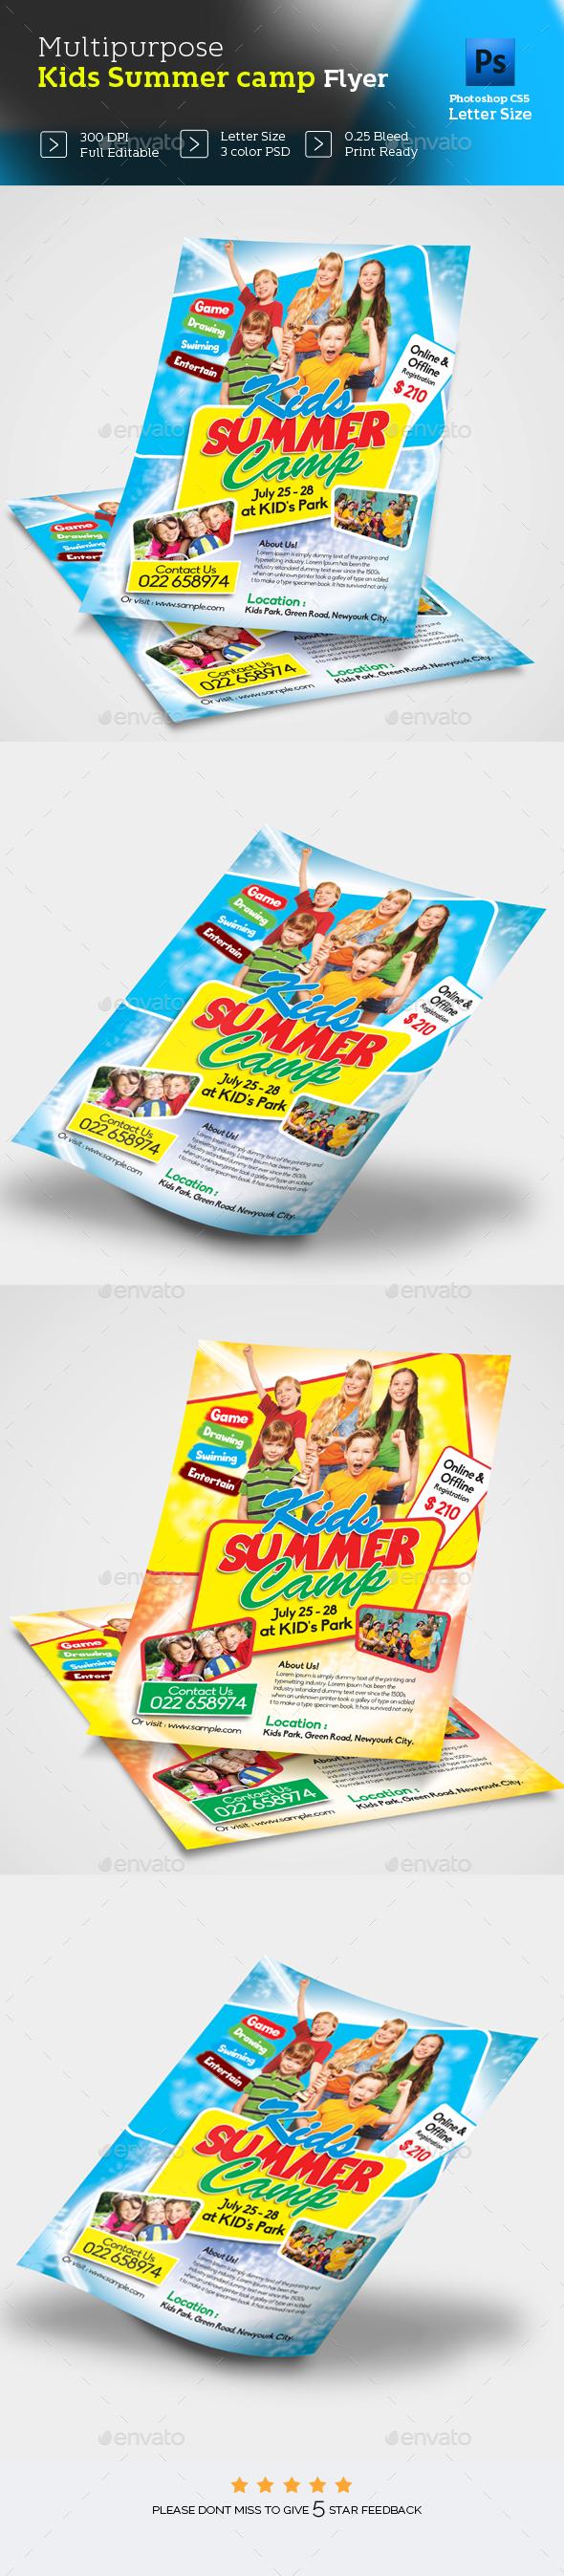 Kids Summer Camp Flyer Design - Flyers Print Templates